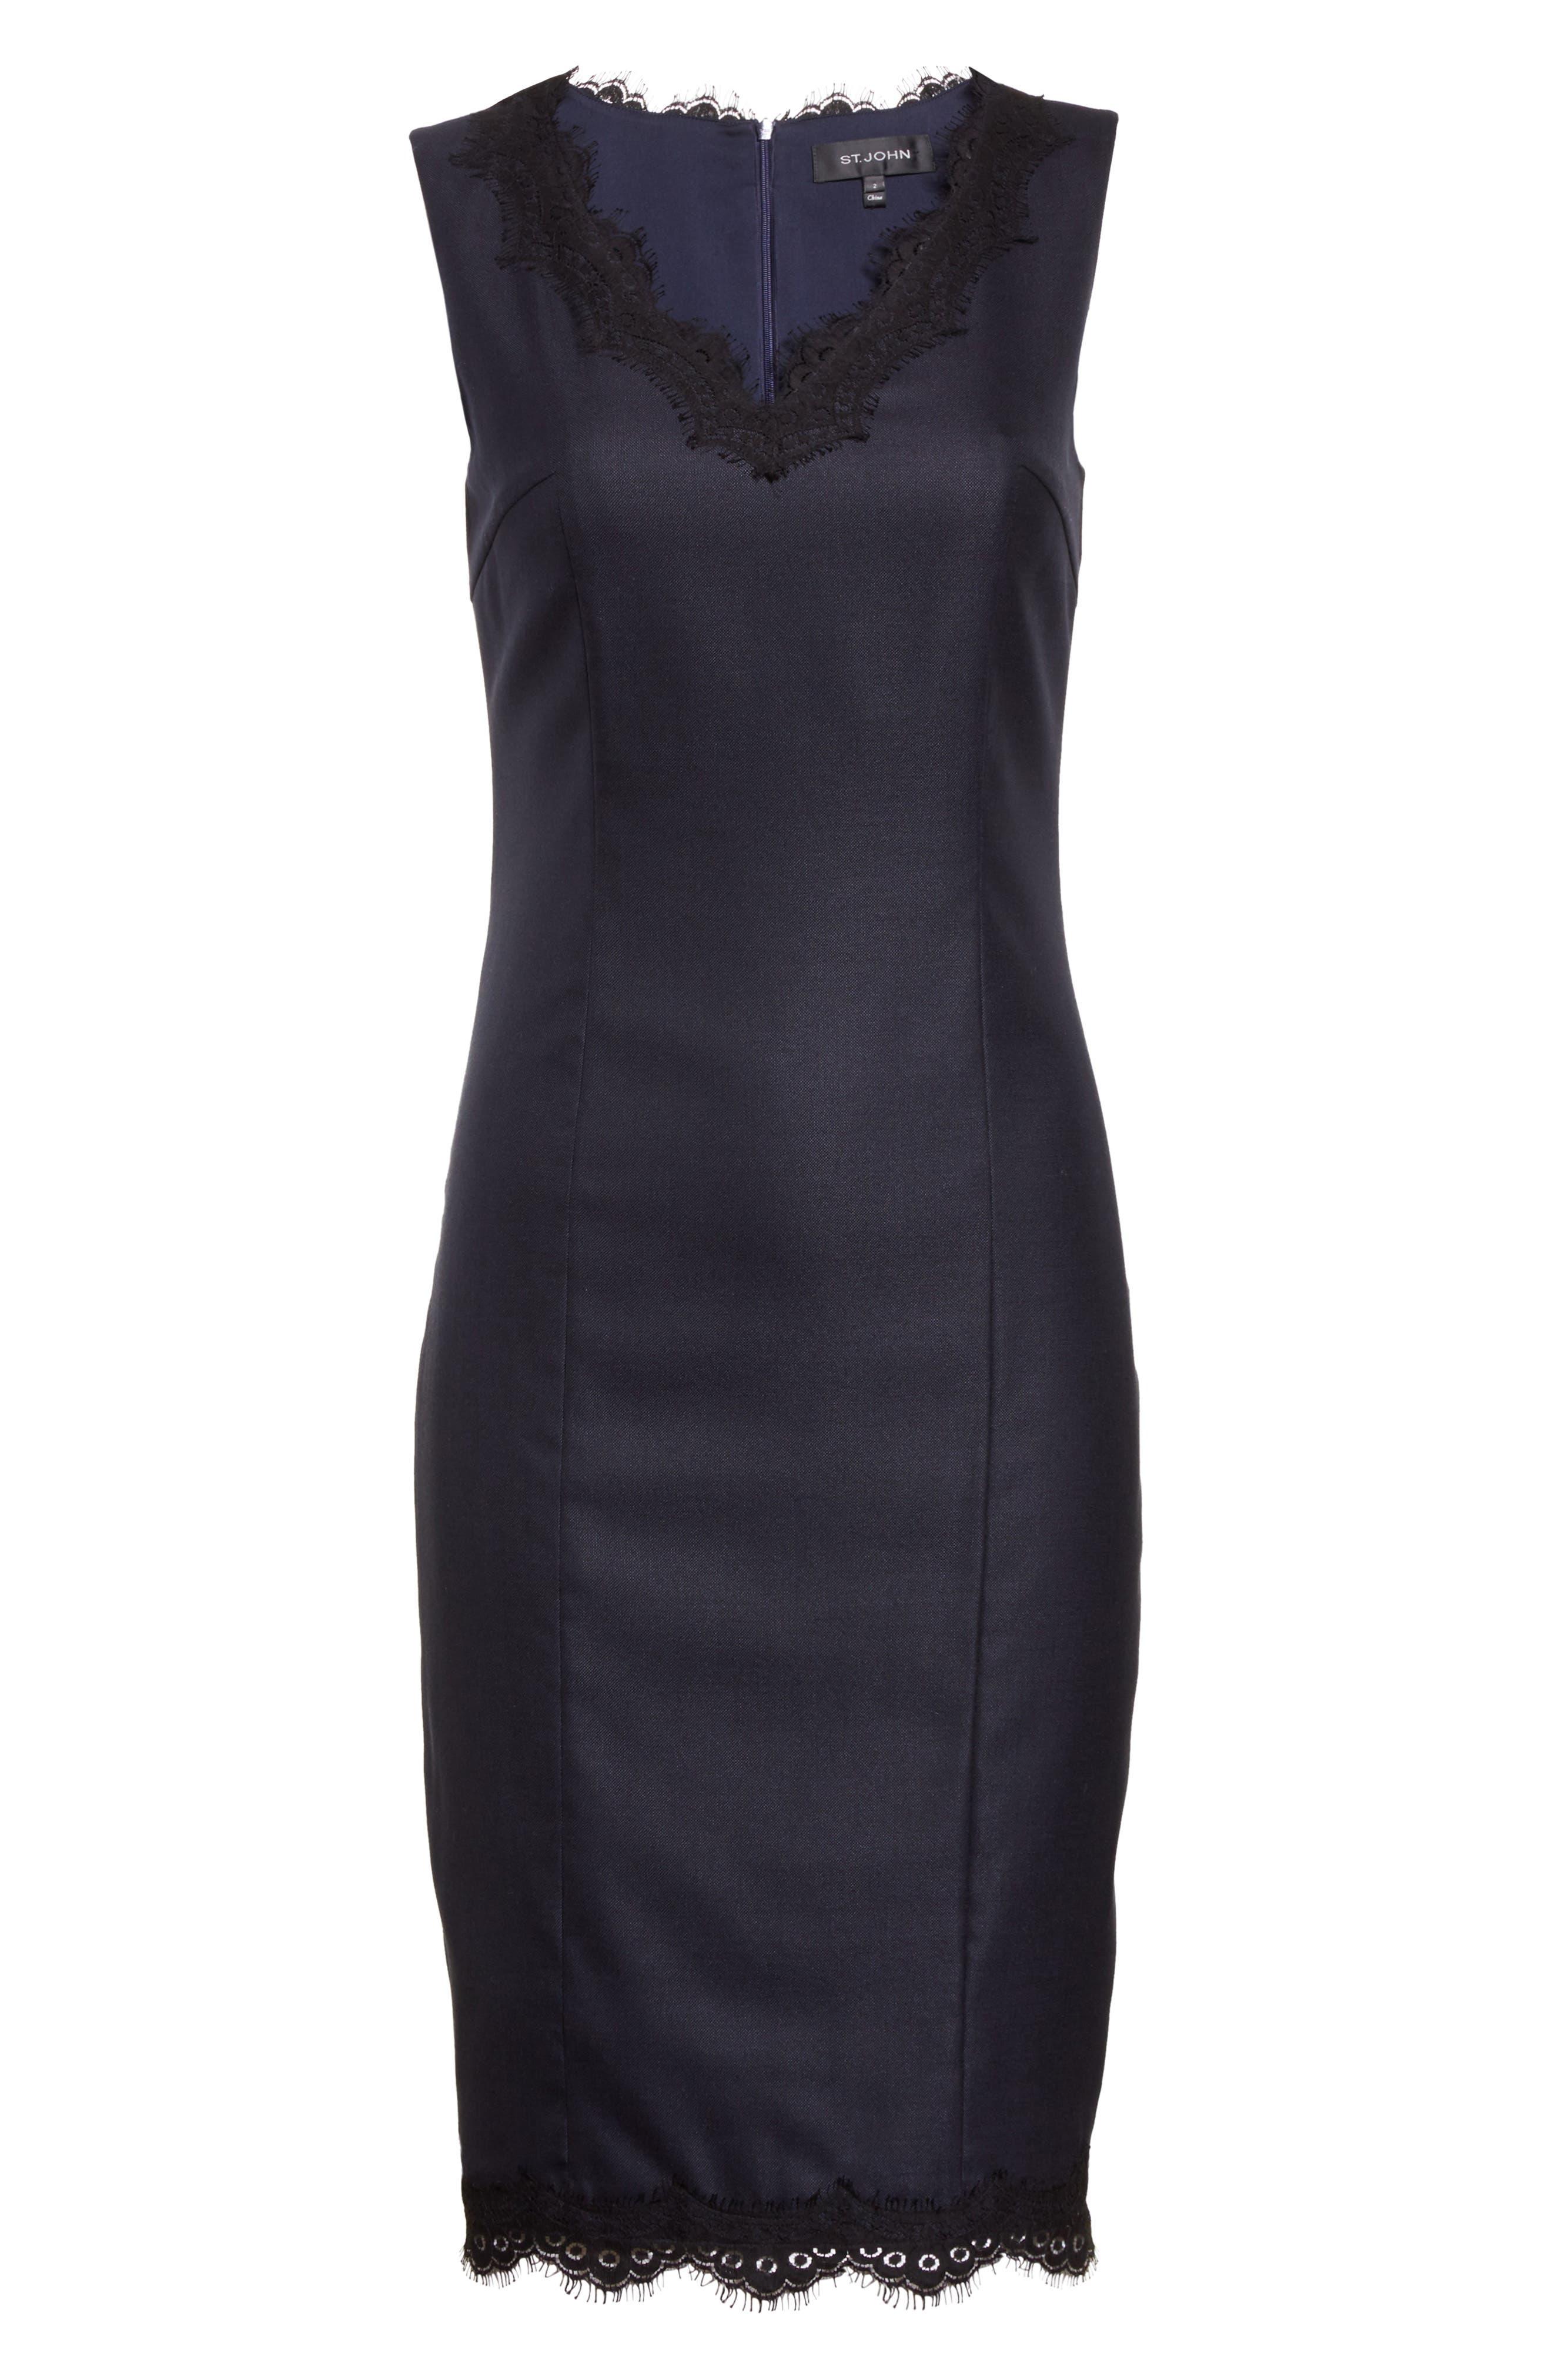 Stretch Birdseye Sheath Dress,                             Alternate thumbnail 7, color,                             Navy/ Caviar